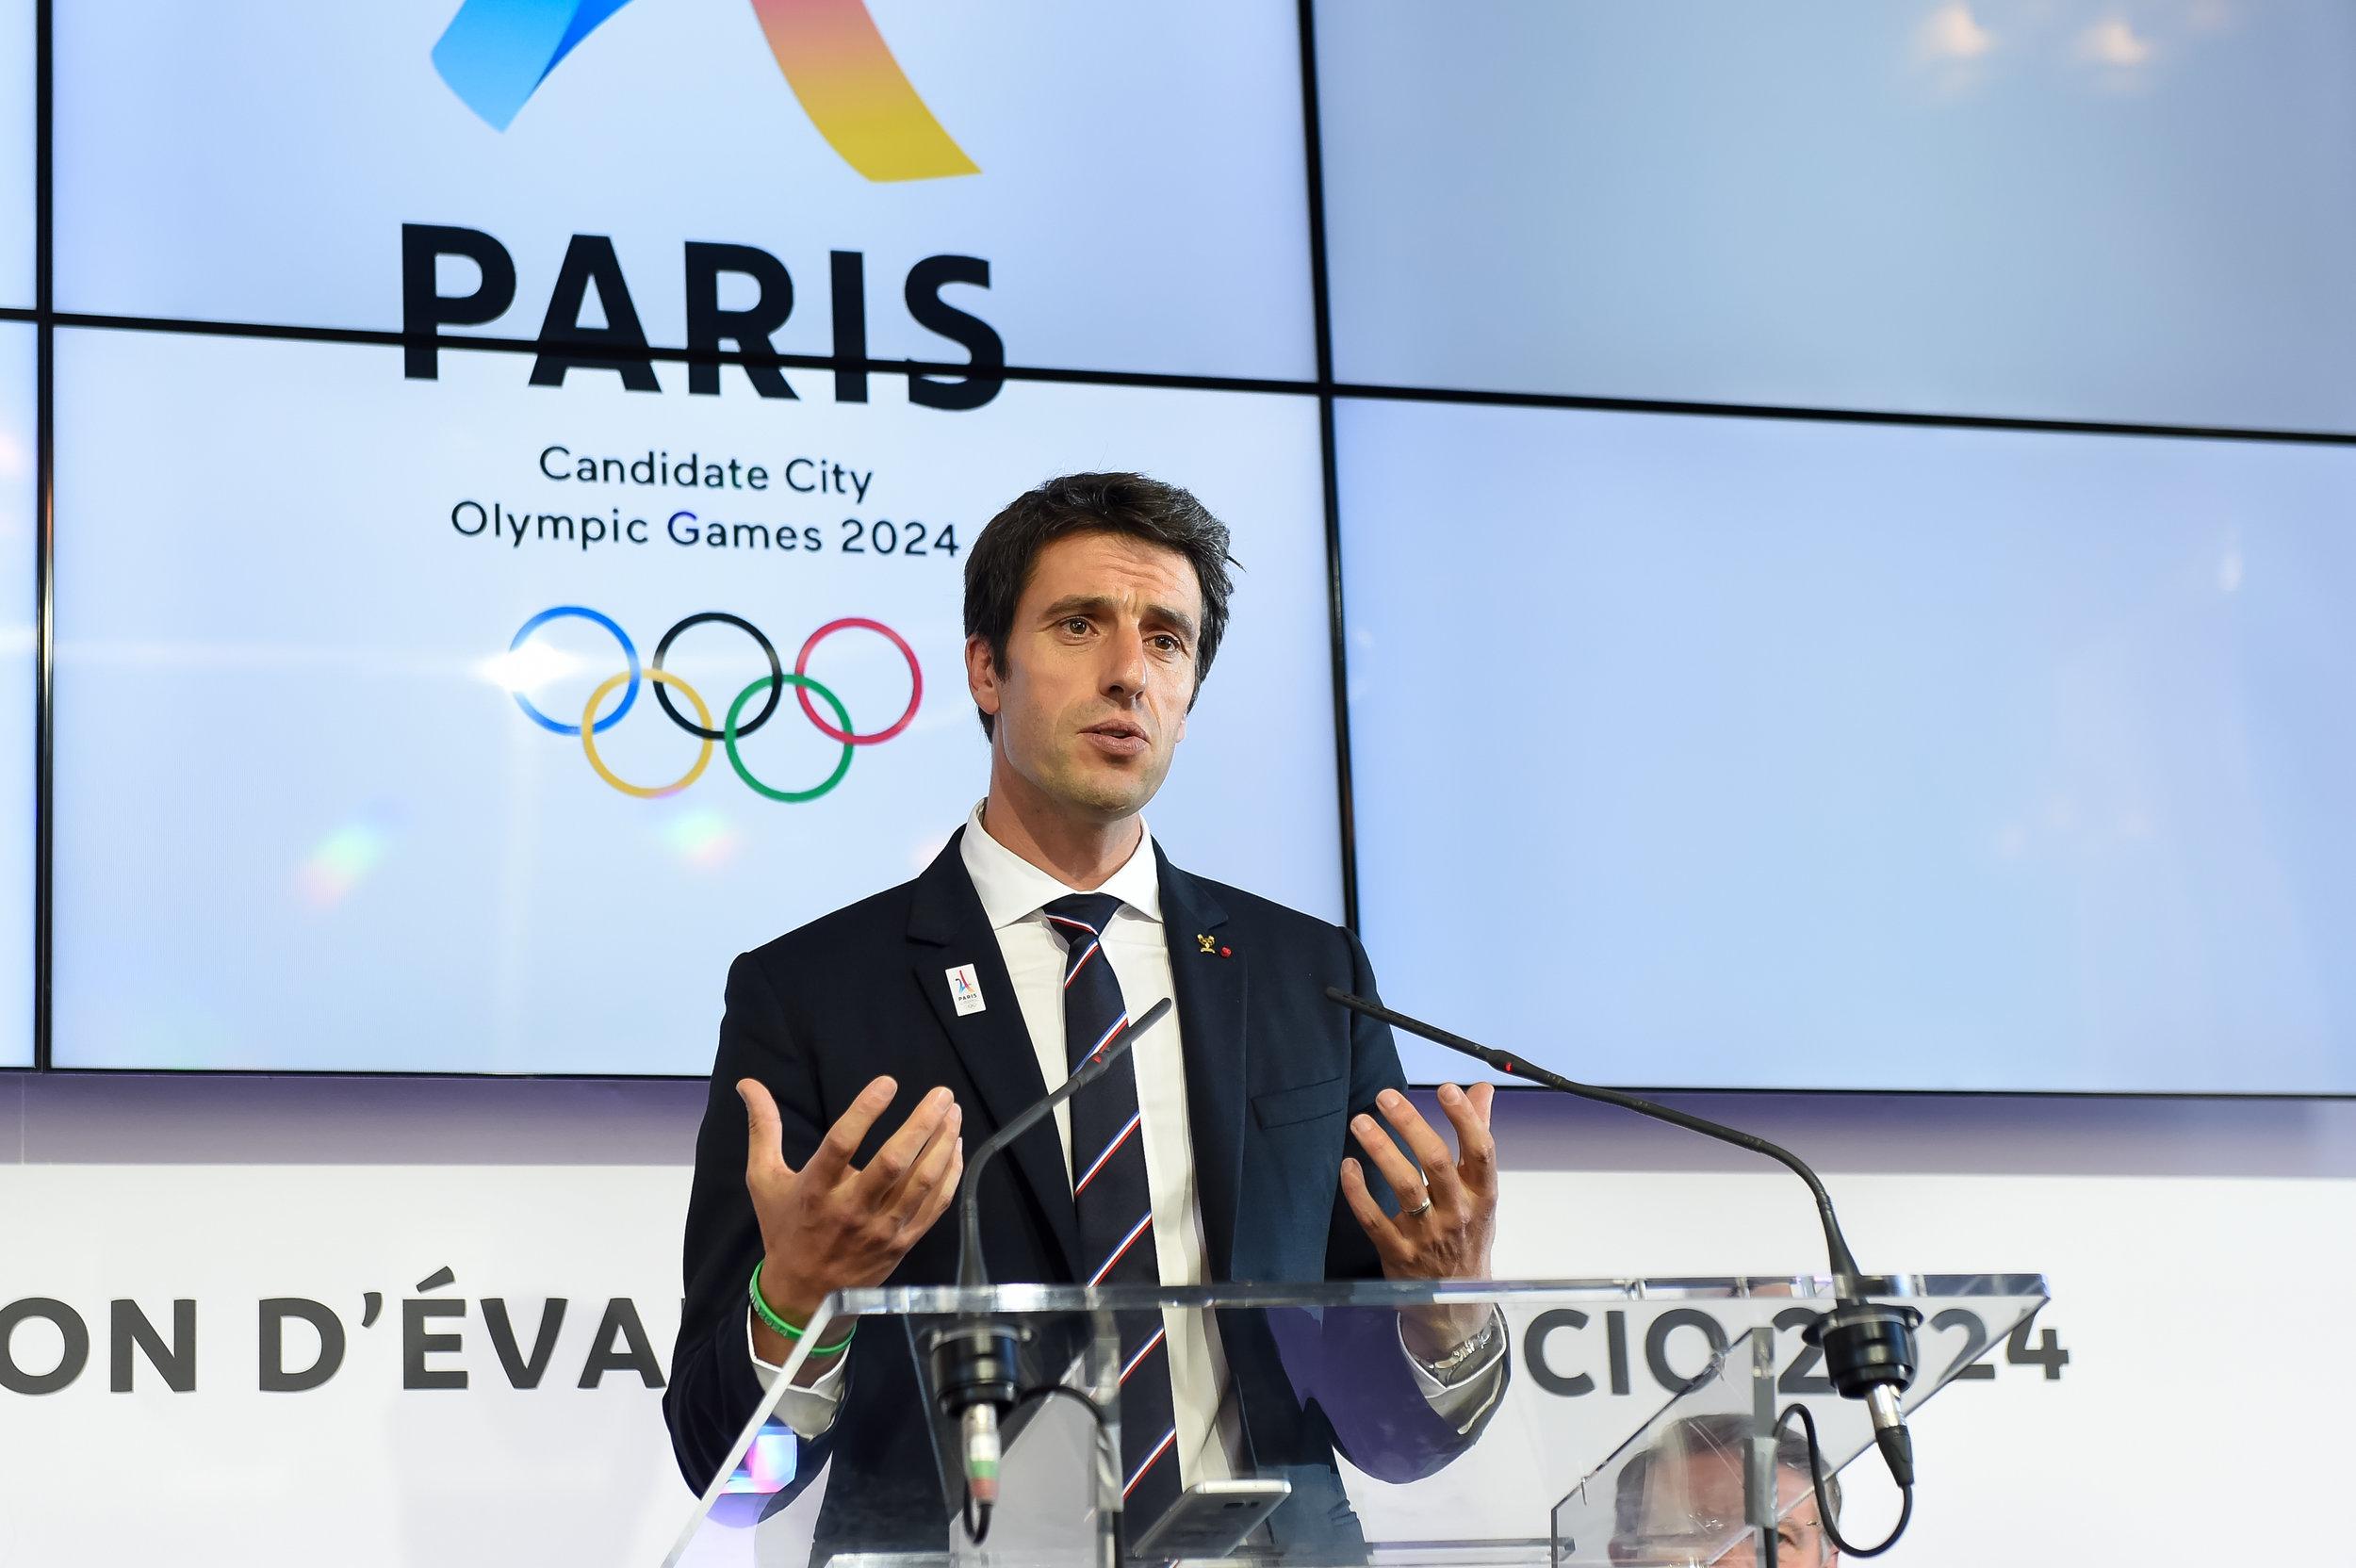 Tony Estanguet at Tuesday's news conference // Jean-Marie Hervio / KMSP / Paris 2024